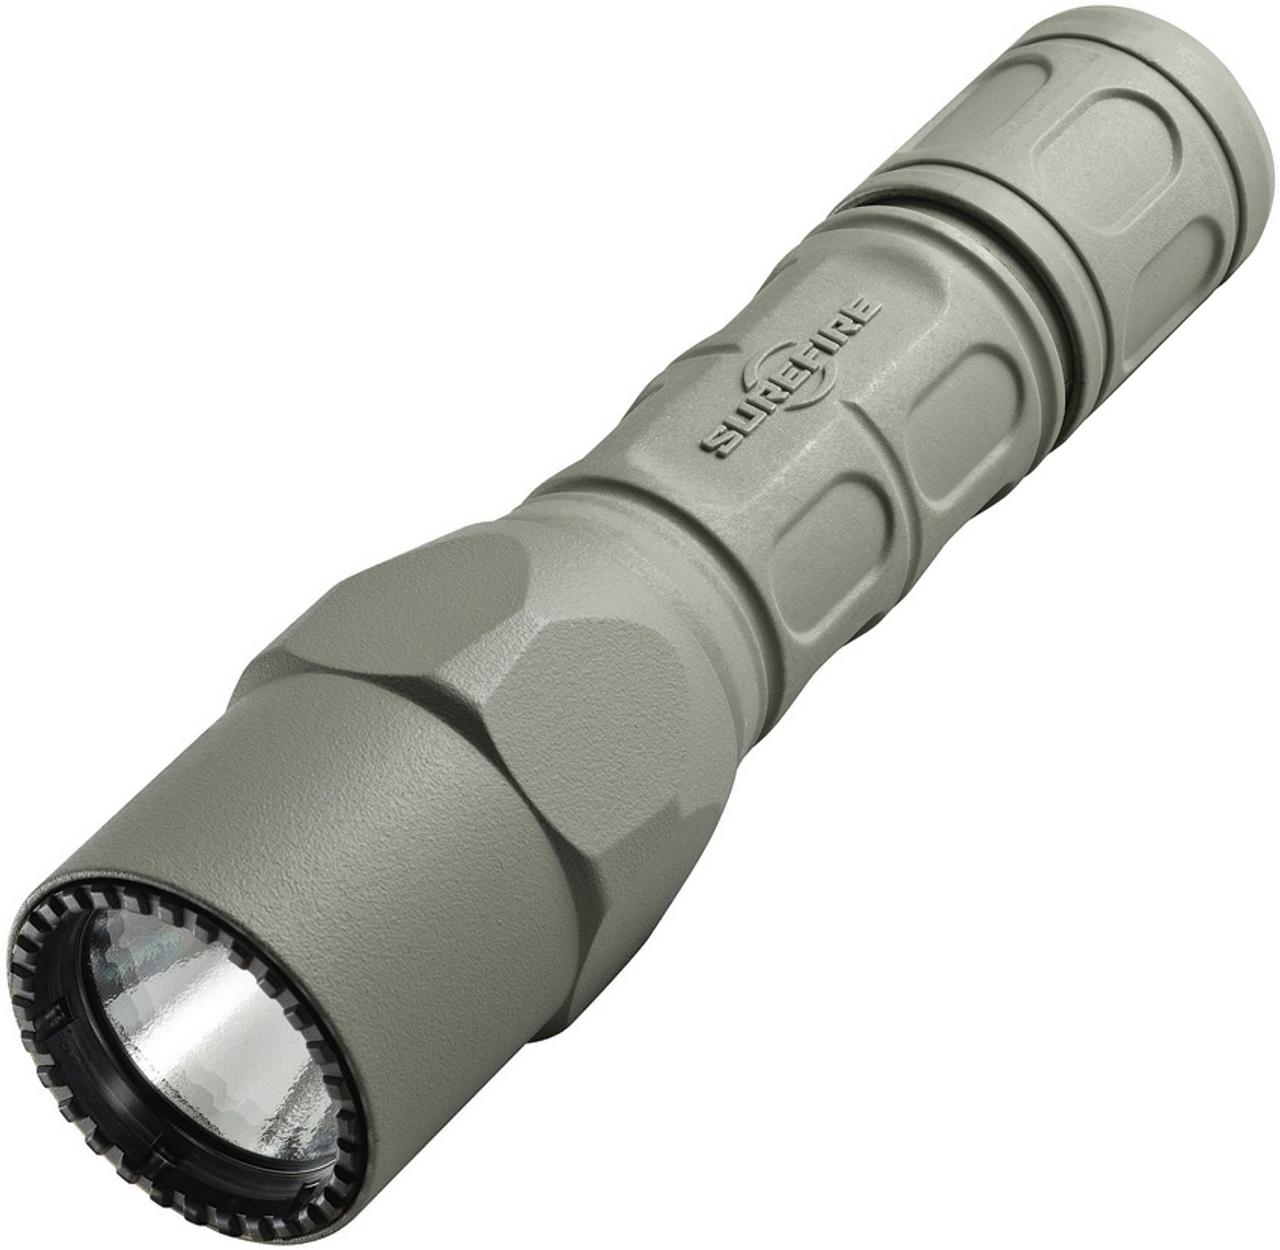 Surefire G2X-D-Tn G2X Pro-Tan 15//600 Lm-Led